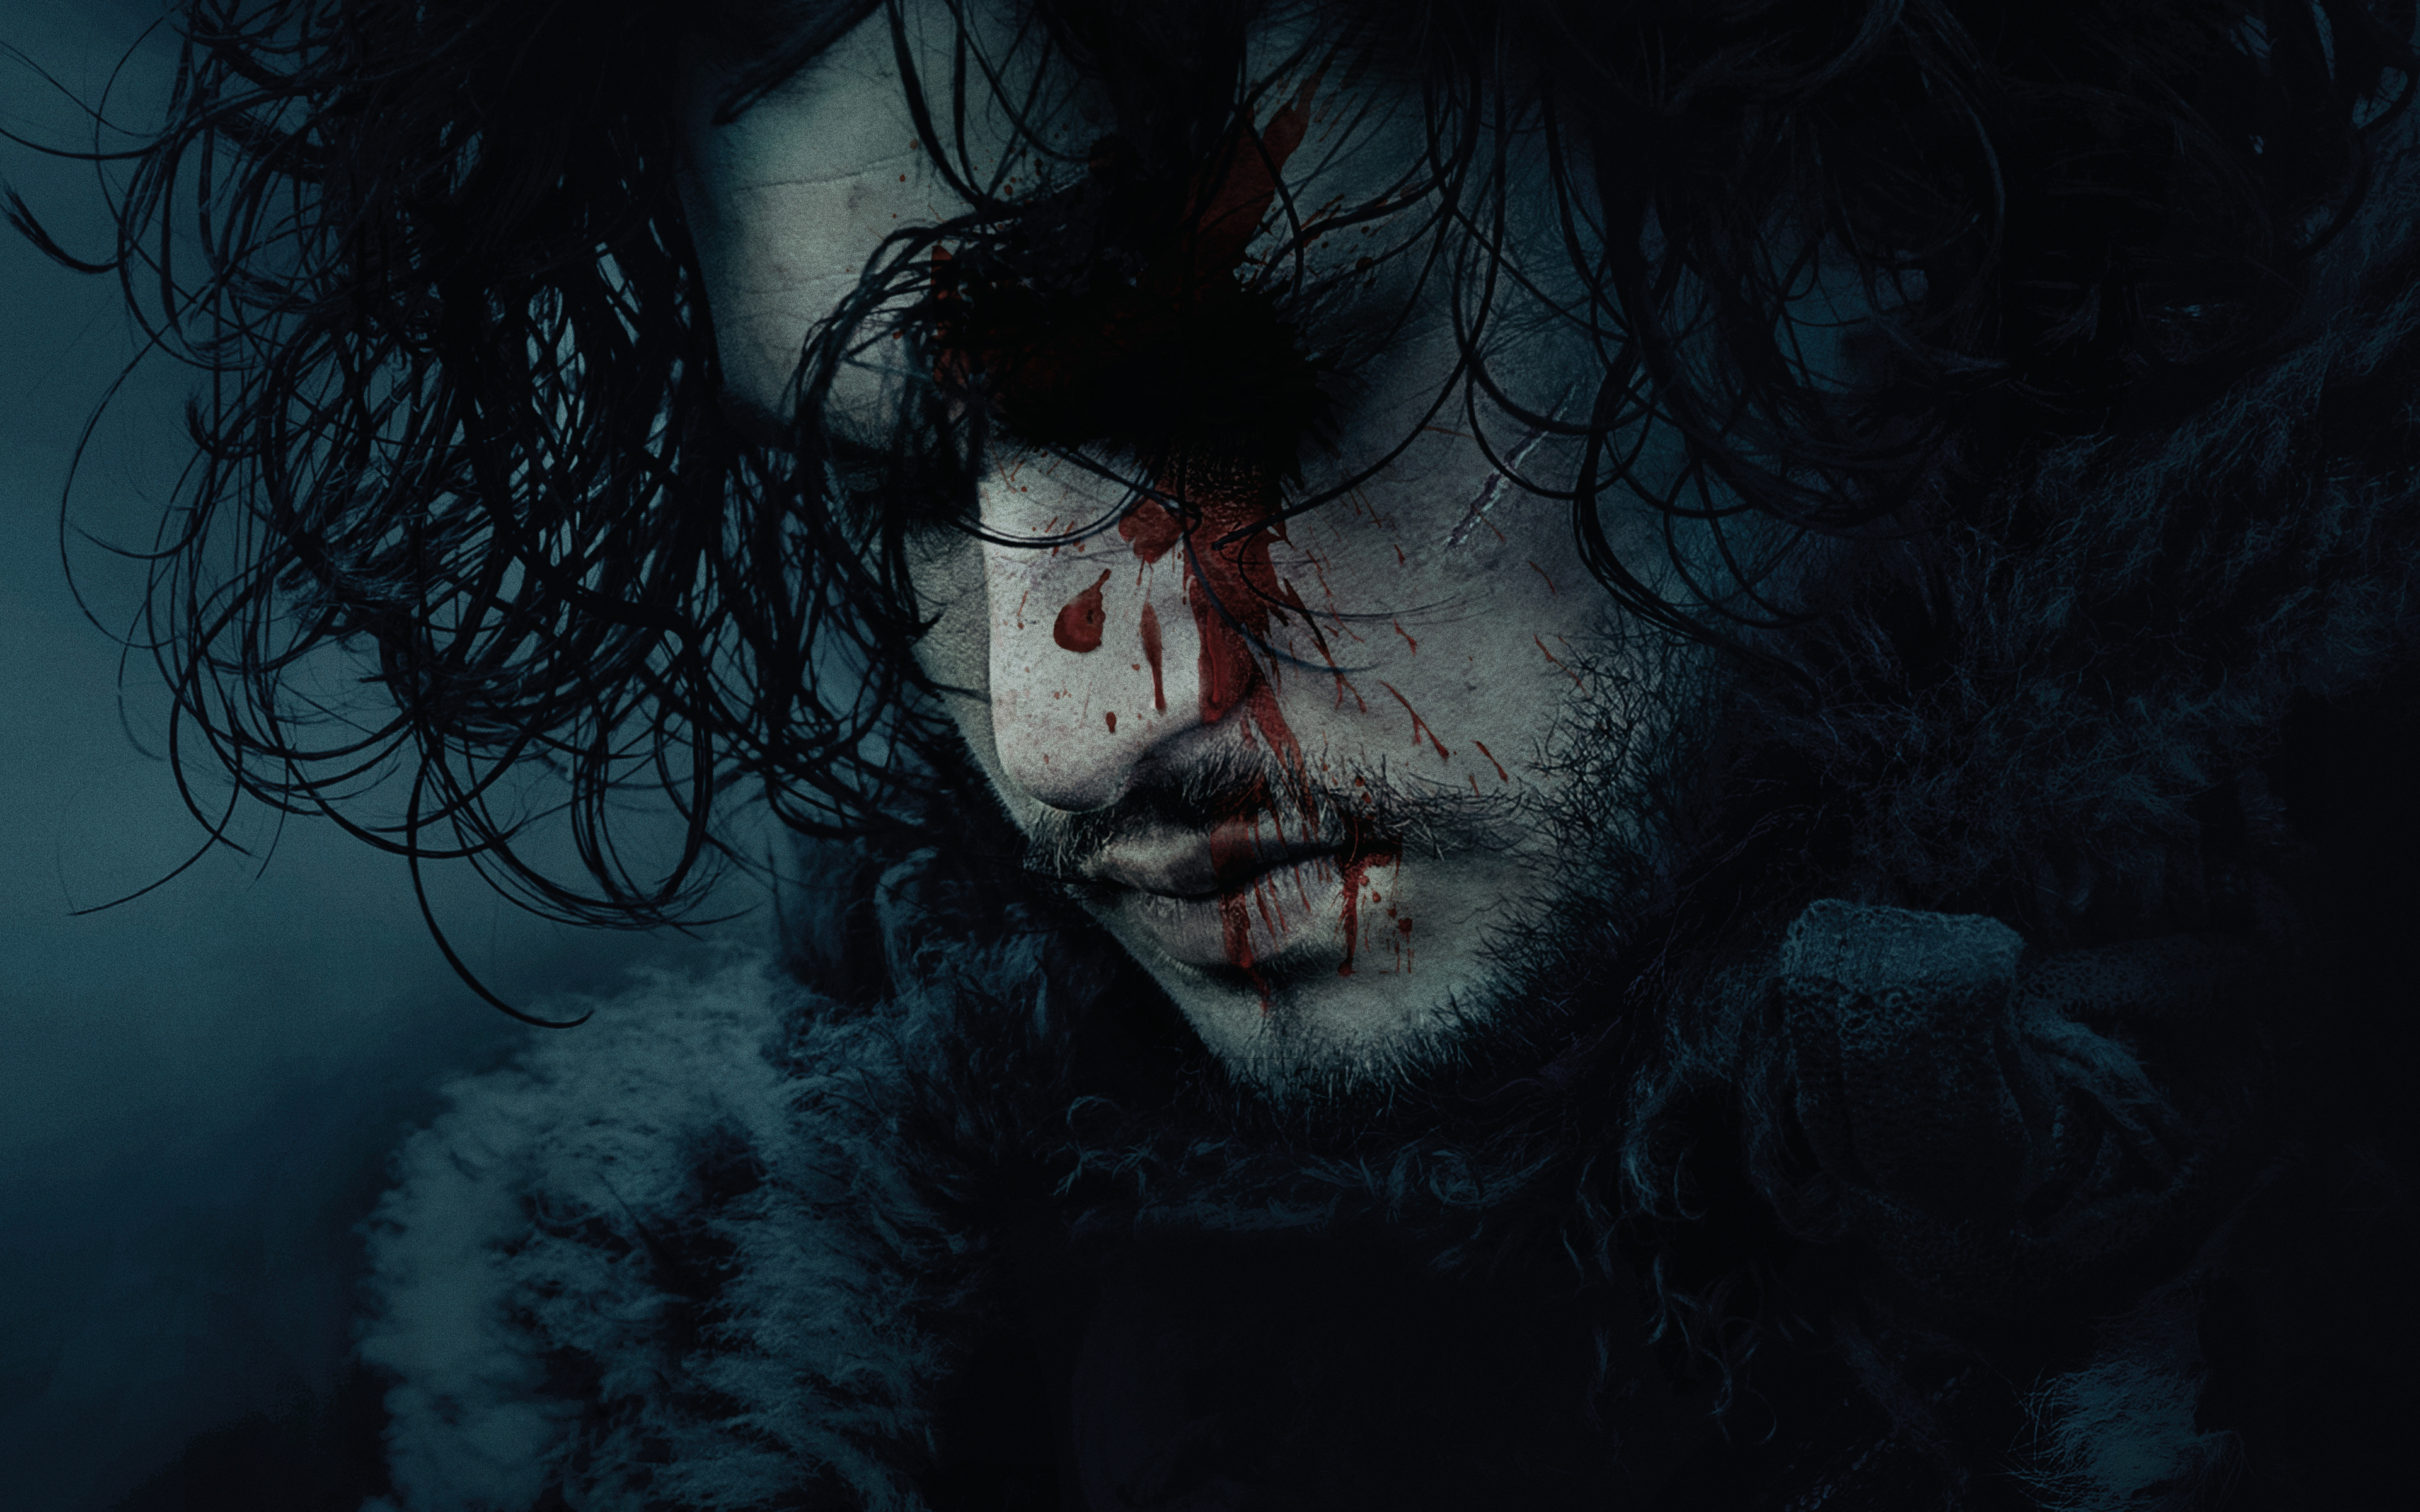 Kit Harington As Jon Snow In Game Of Thrones 4k Wallpapers Hd